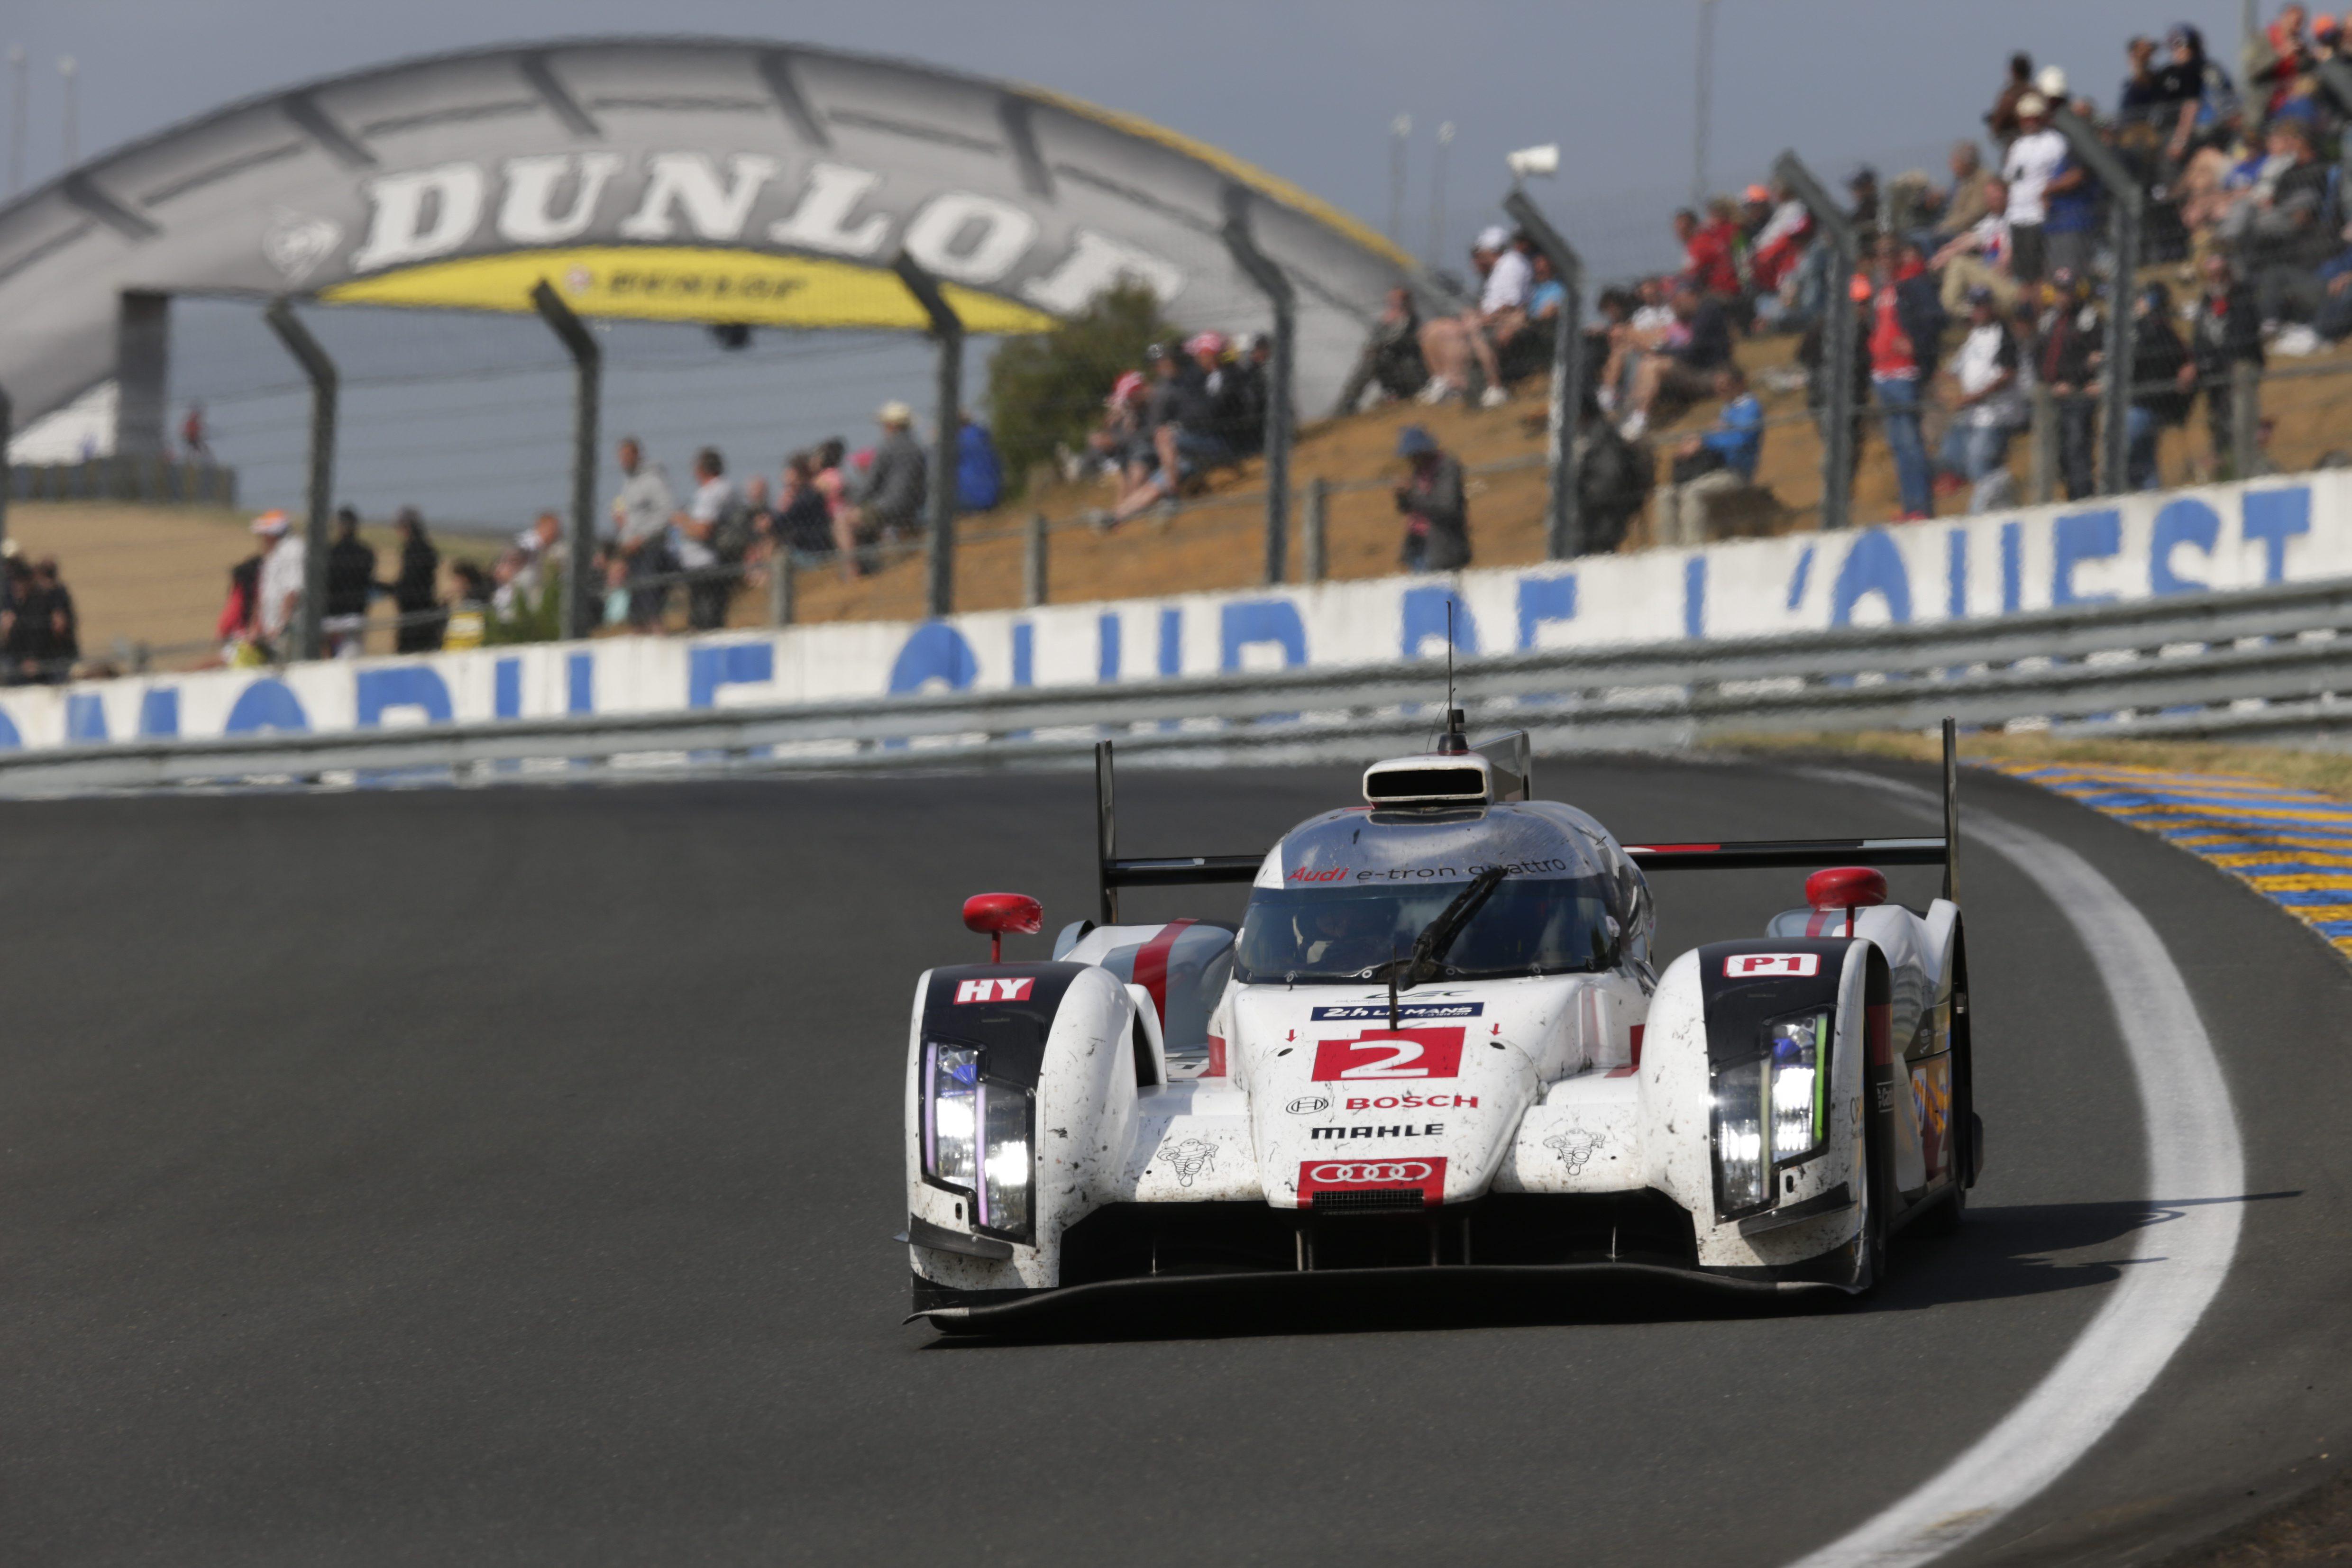 Audi R18 e-tron quattro das Siegerauto in Le Mans